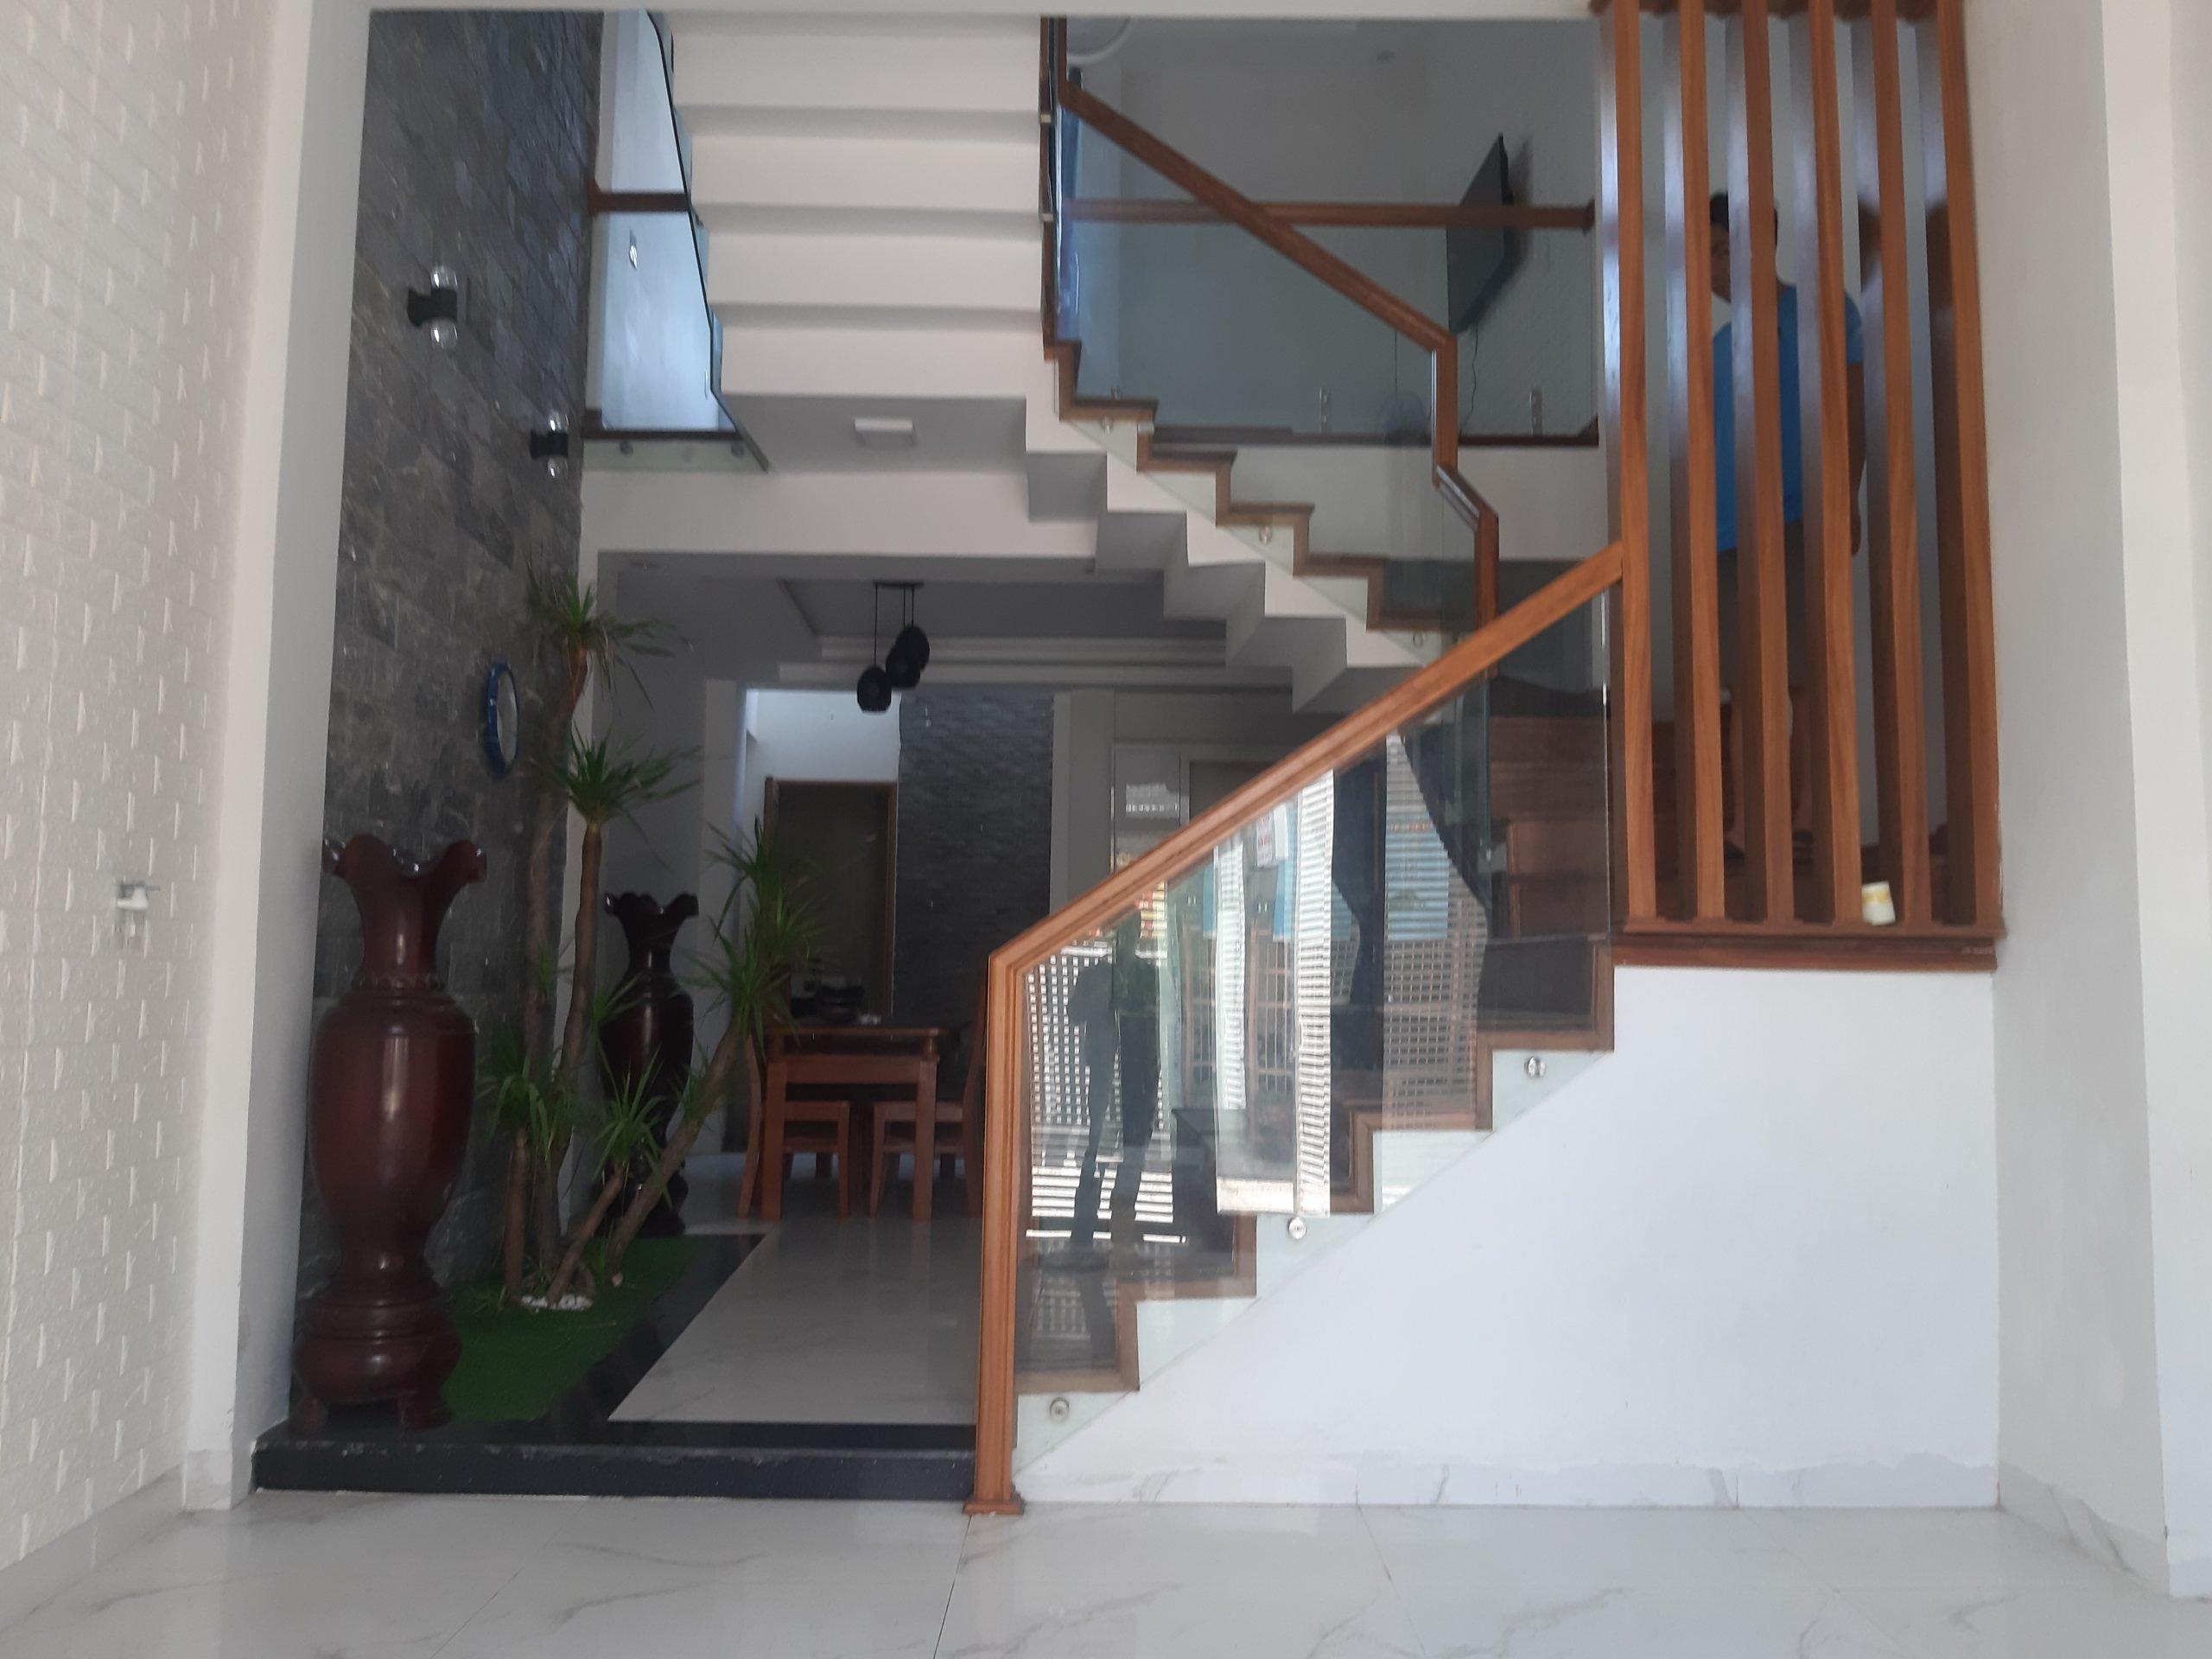 4 bedroom house for rent near Dragon Bridge Da Nang